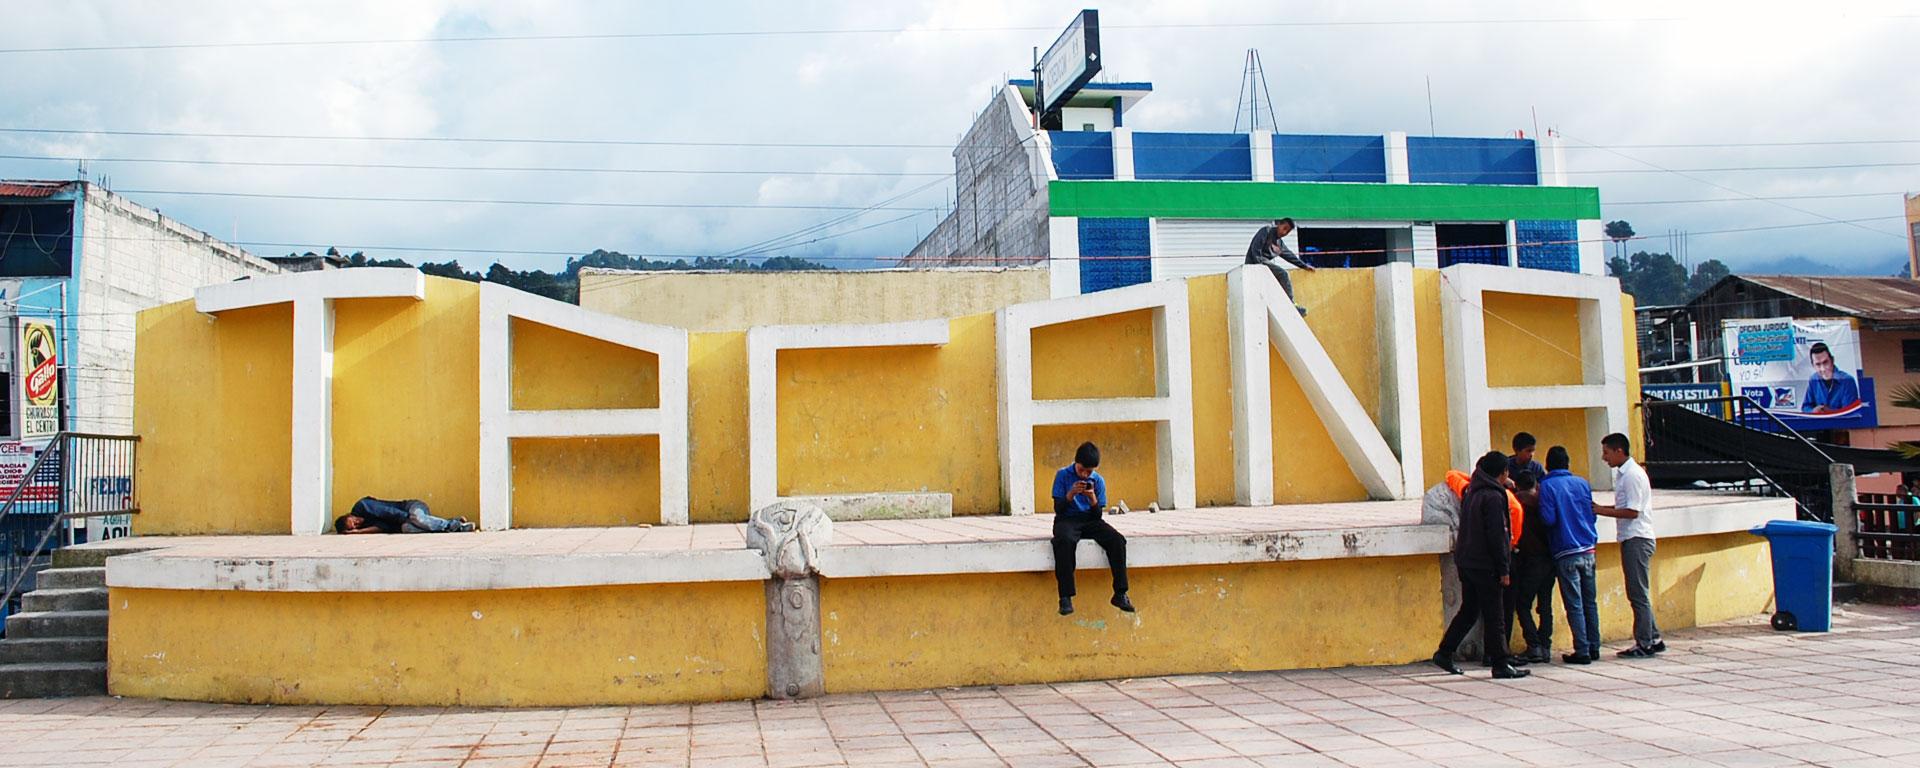 tacana guatemala hermana tierra onlus portici Associazione di volontari laici e cristiani operante in Guatemala